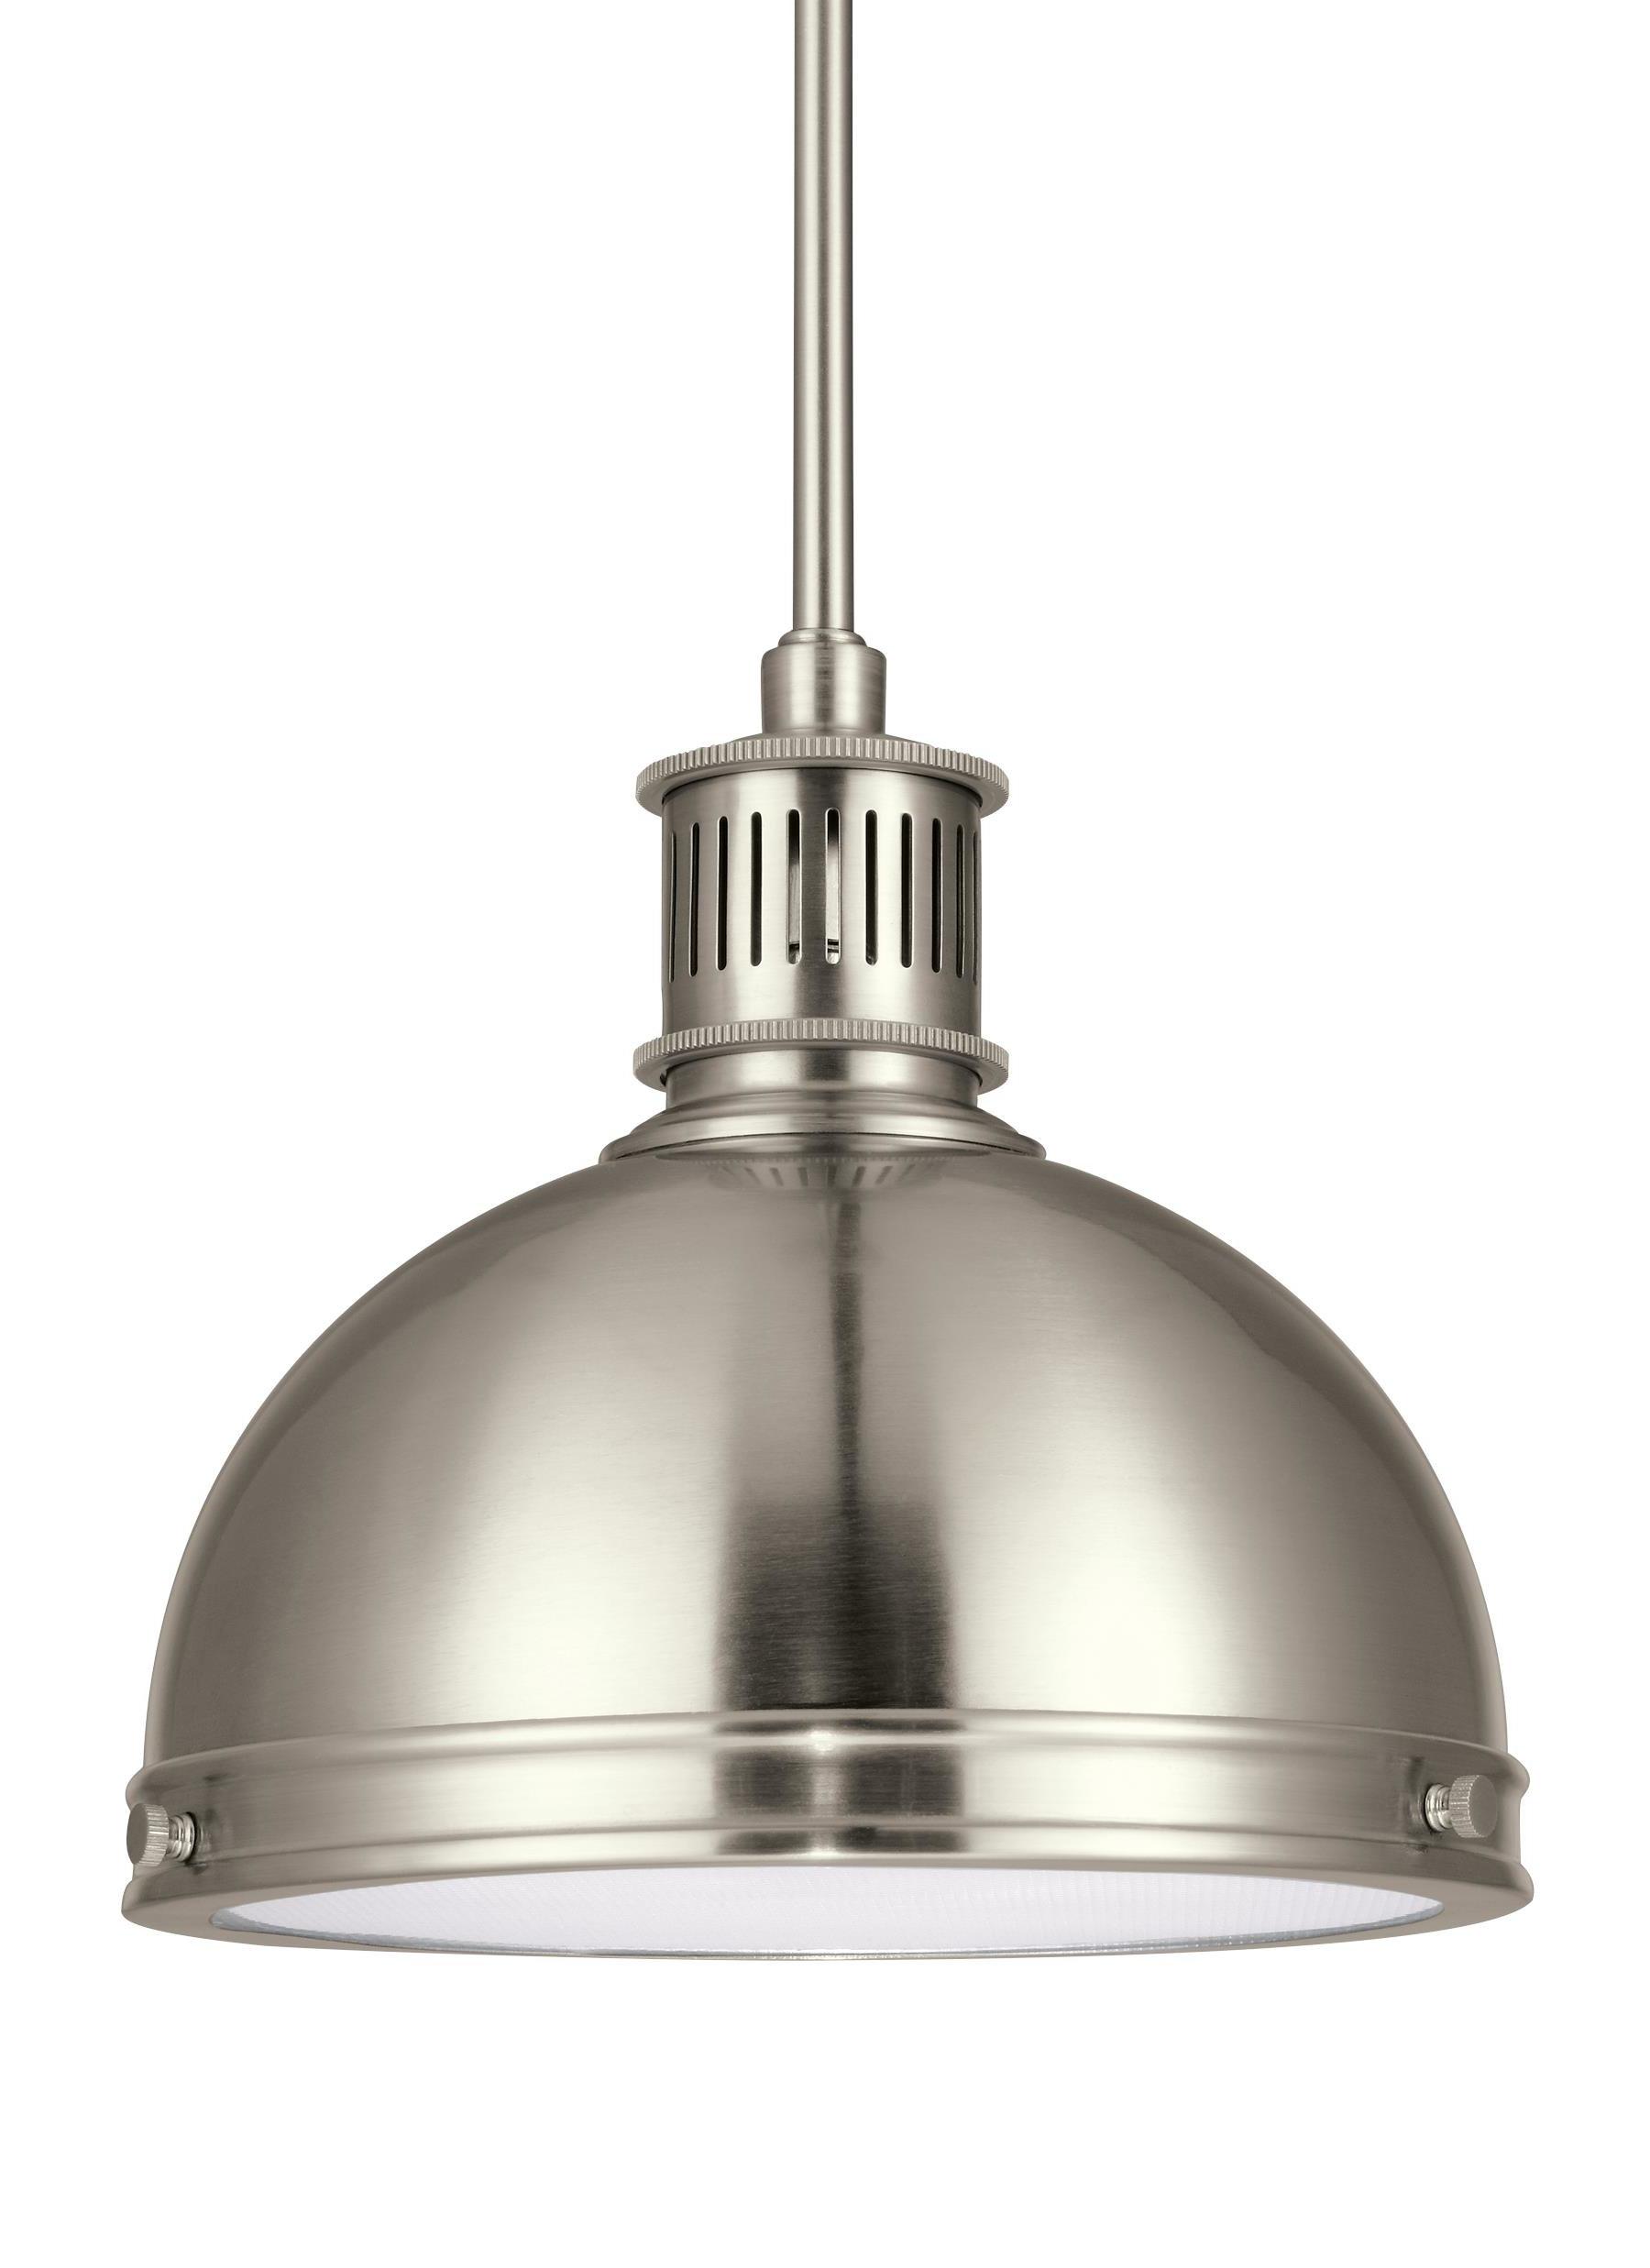 Recent Ninette 1-Light Dome Pendant with Ninette 1-Light Dome Pendants